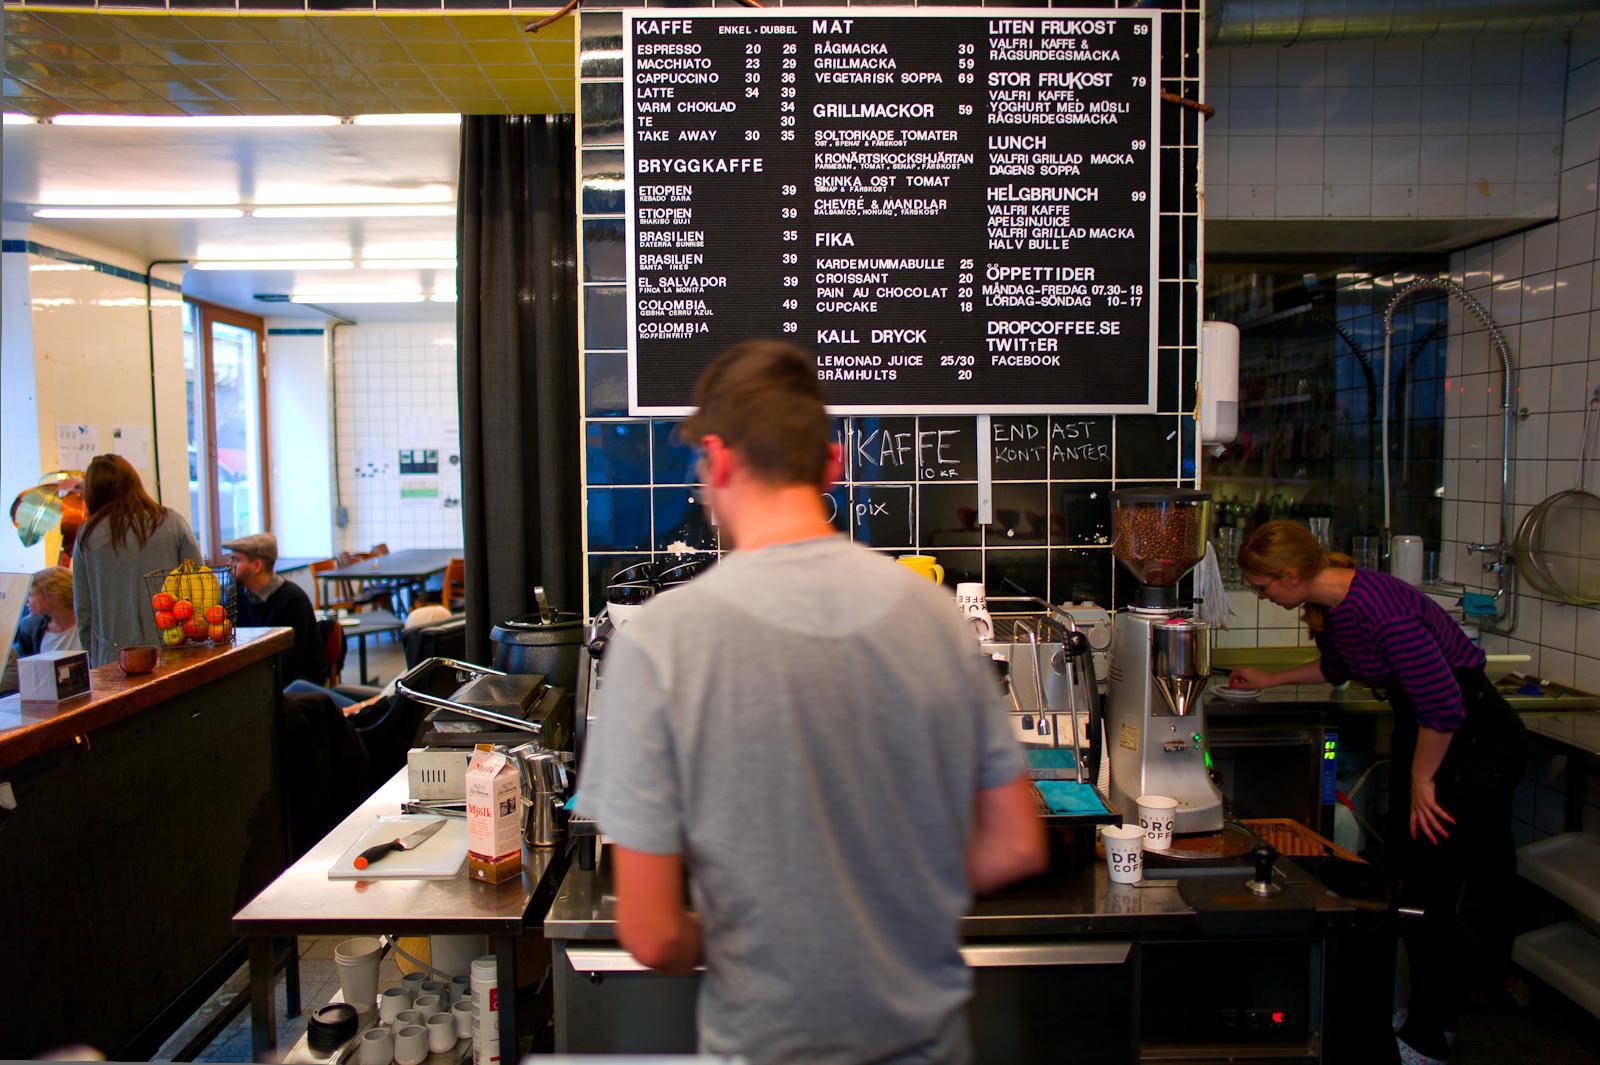 Coffice (Coffee + Office)